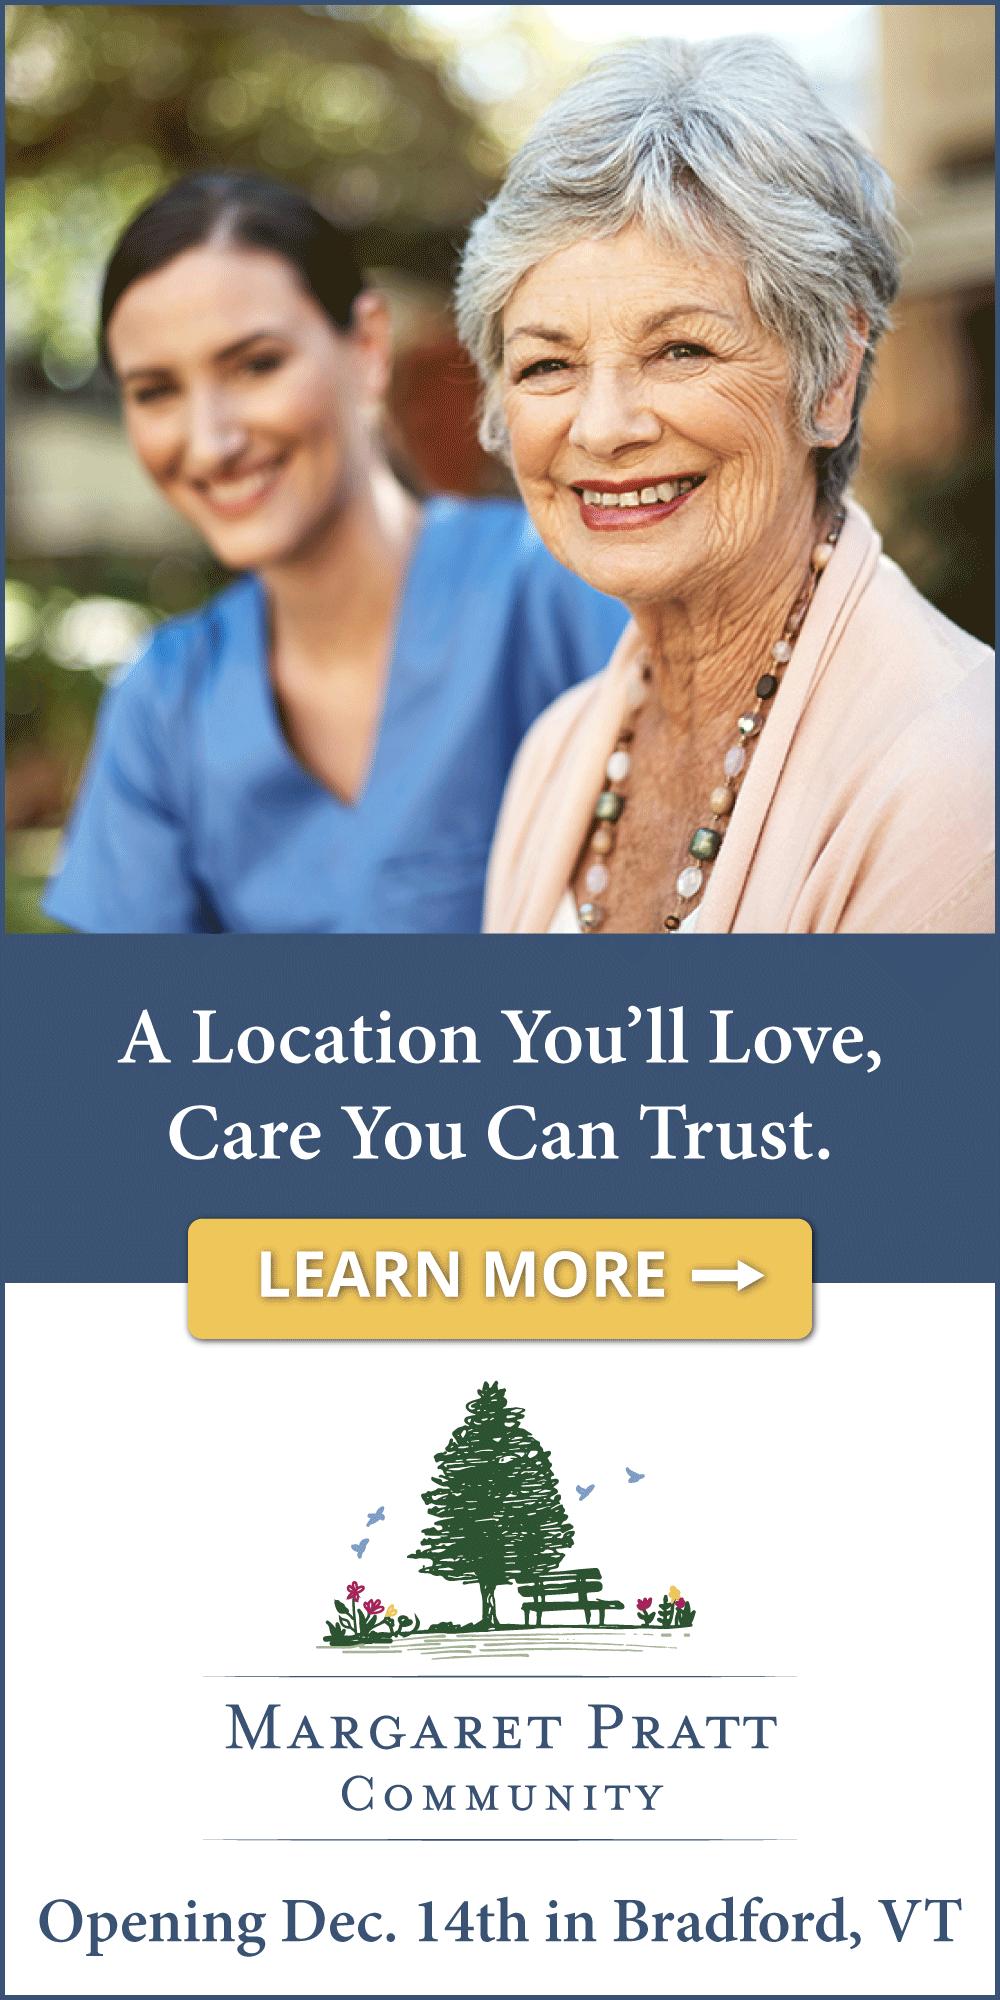 senior-community-ad-example.png